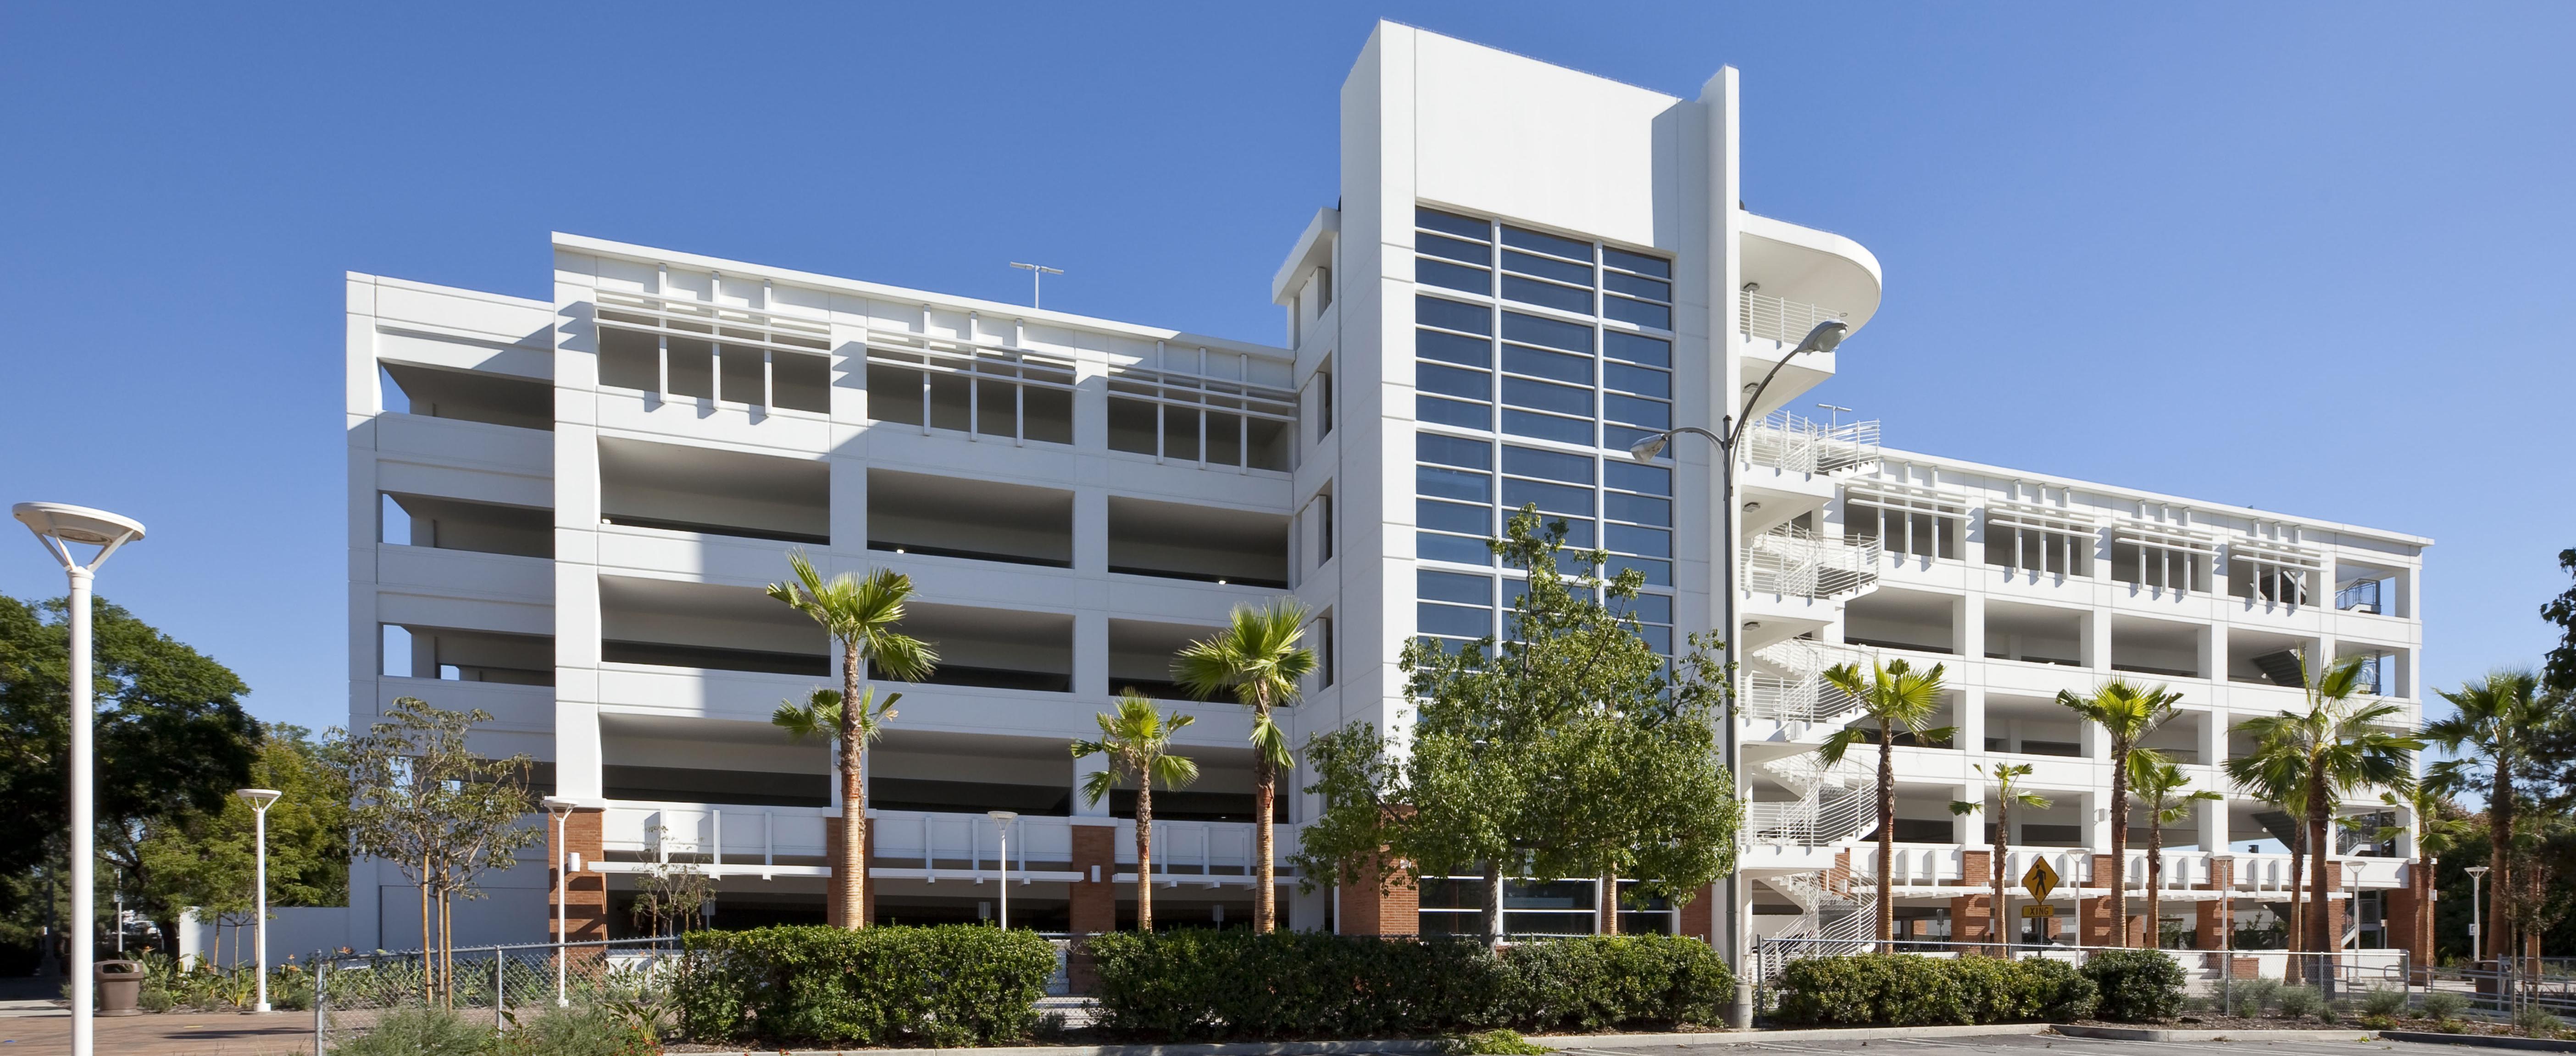 CSU Fullerton Parking Structure #4